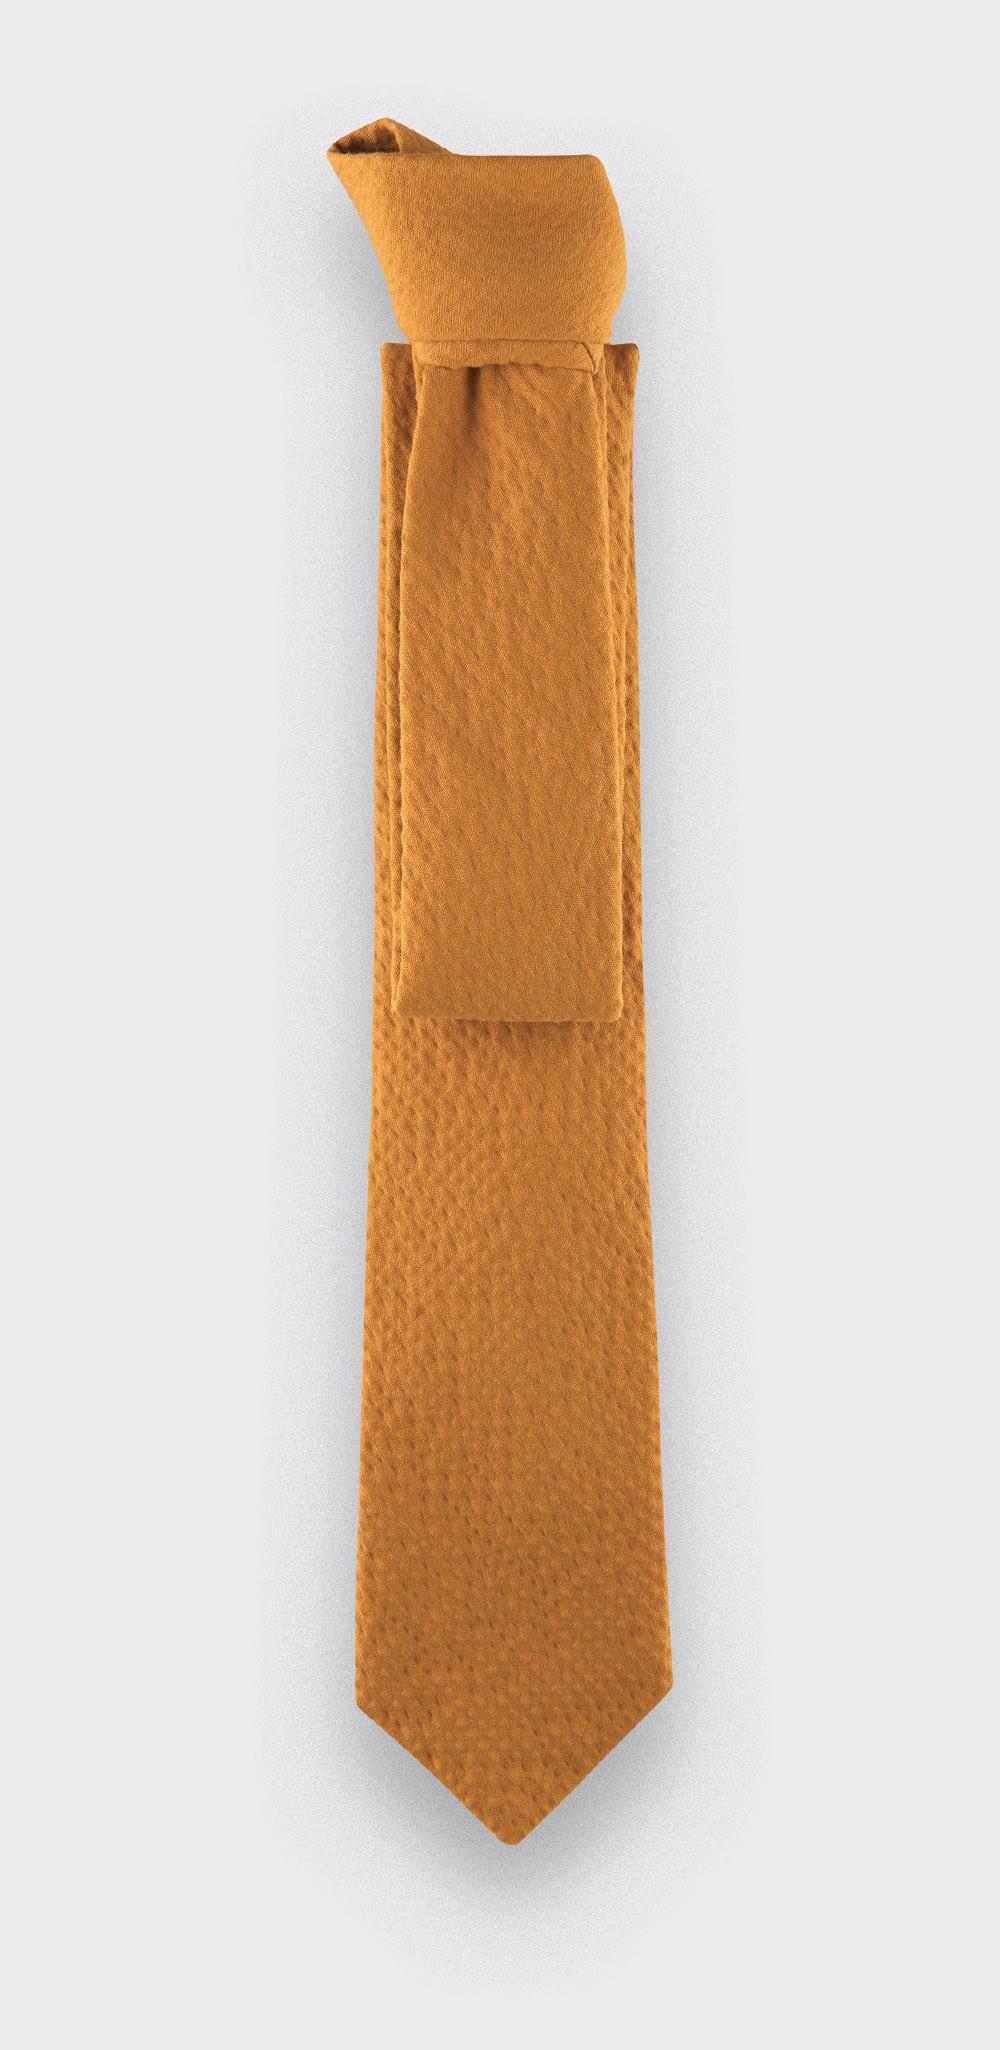 cravate seersucker moutarde - coton et soie - CINABRE Paris